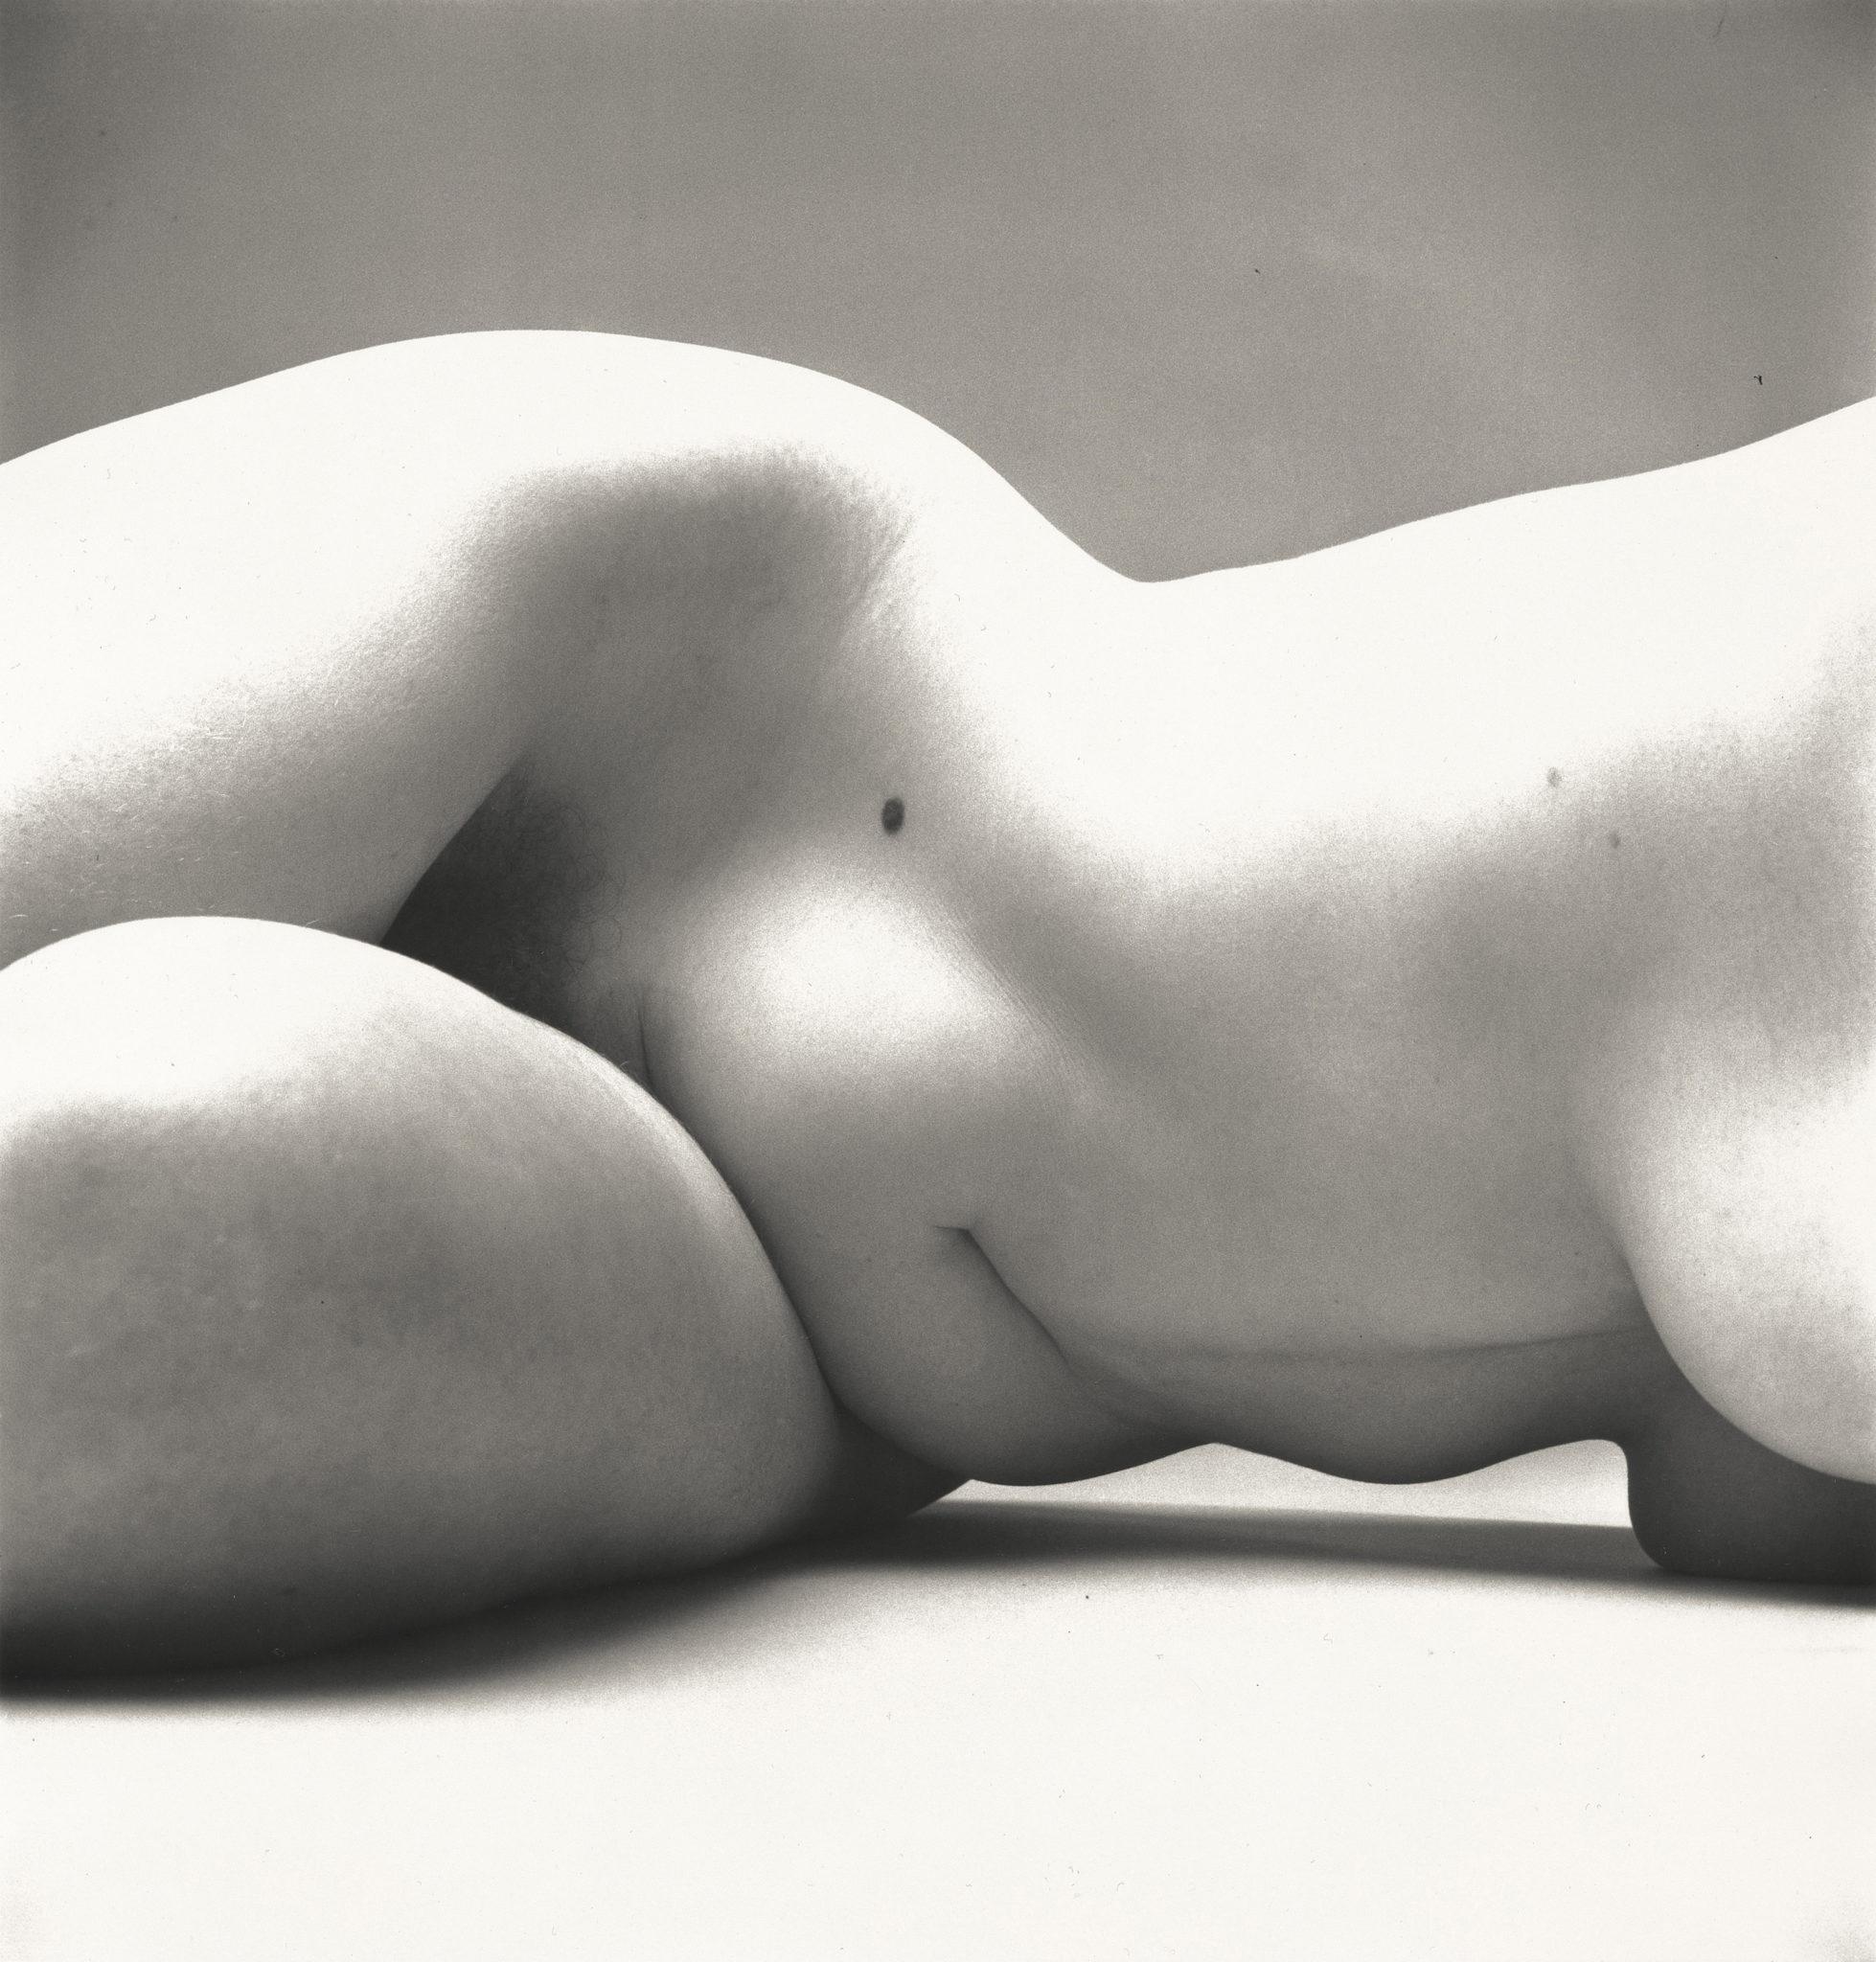 300dpi-Nude 72